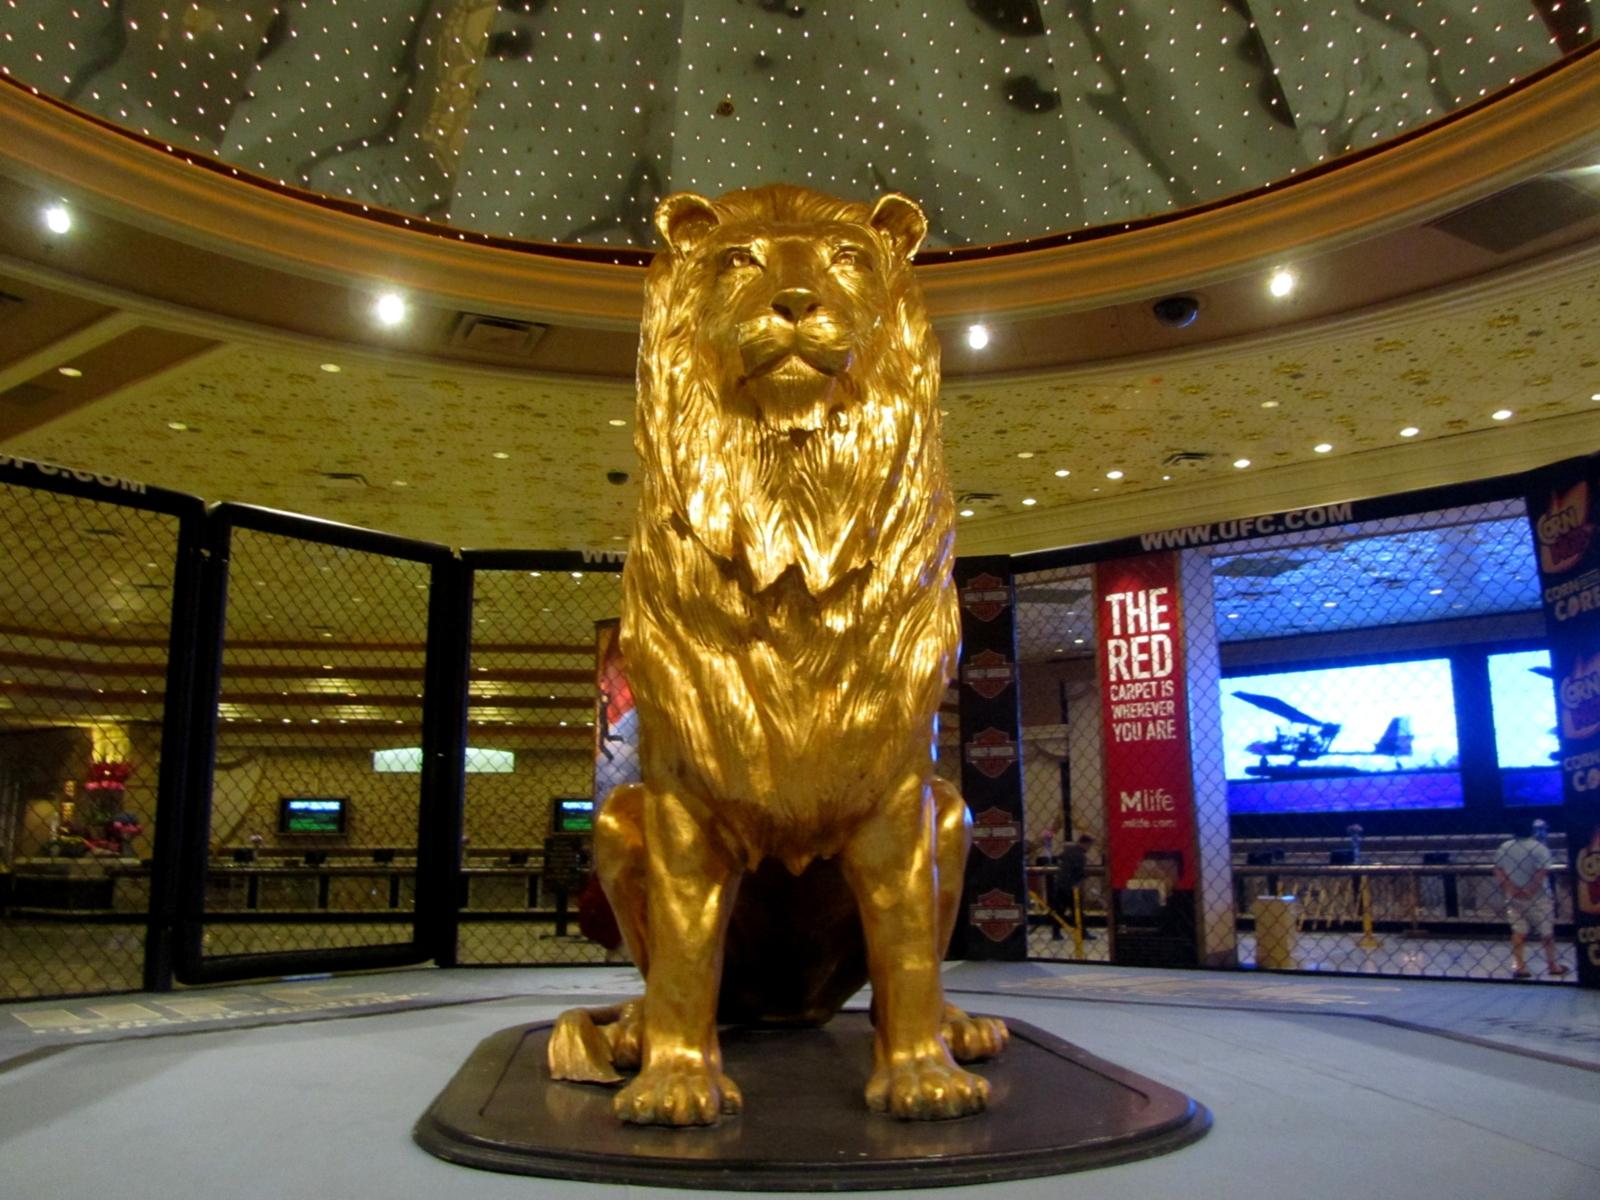 Gold Lion Statue Labels: golden golden mayer: imgarcade.com/1/gold-lion-statue